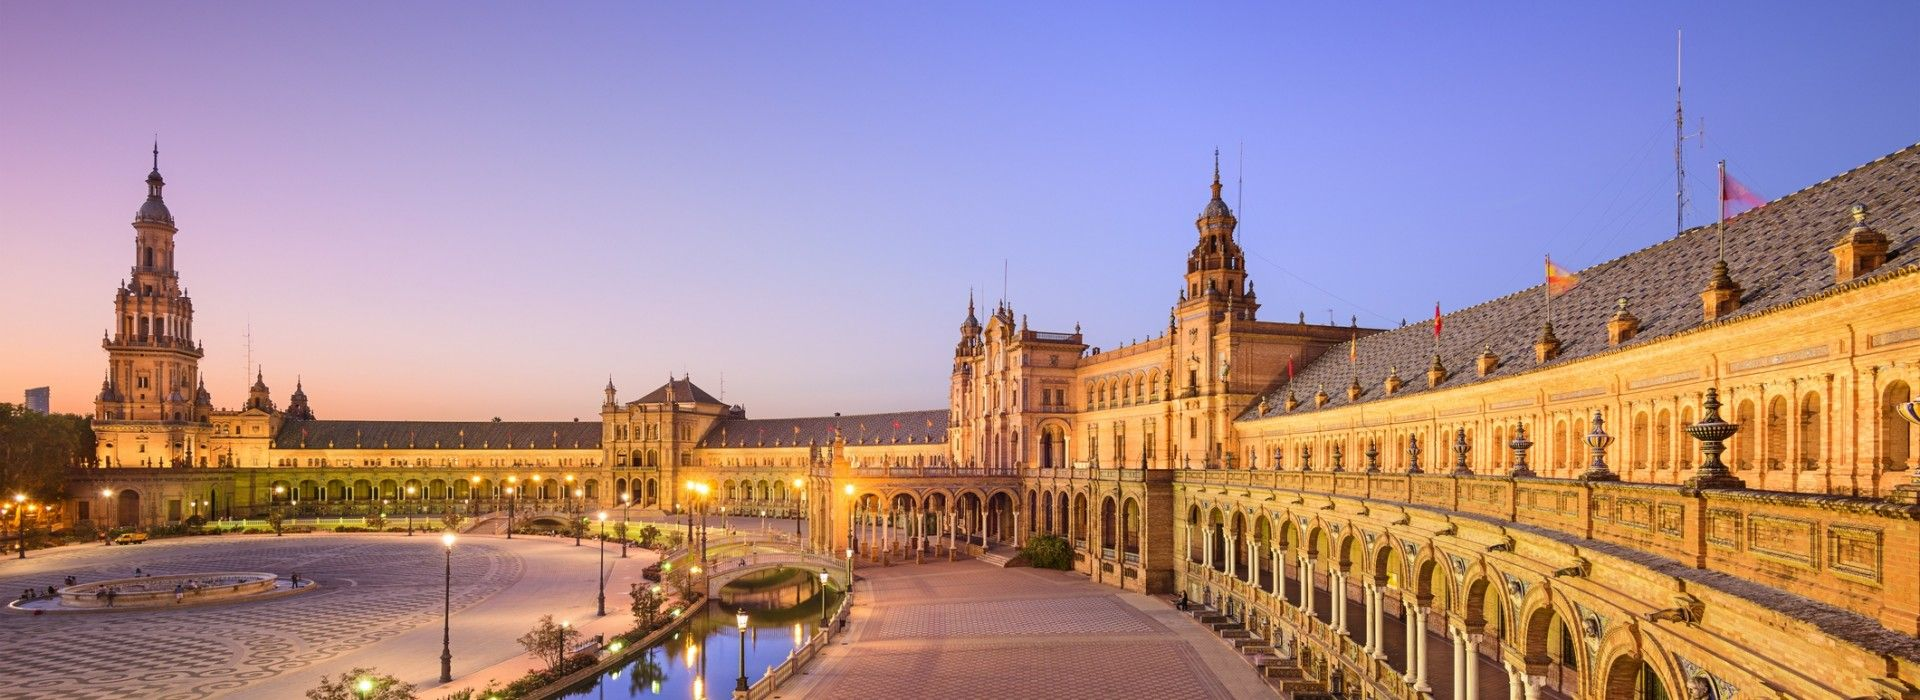 Castile y León & La Rioja Tours